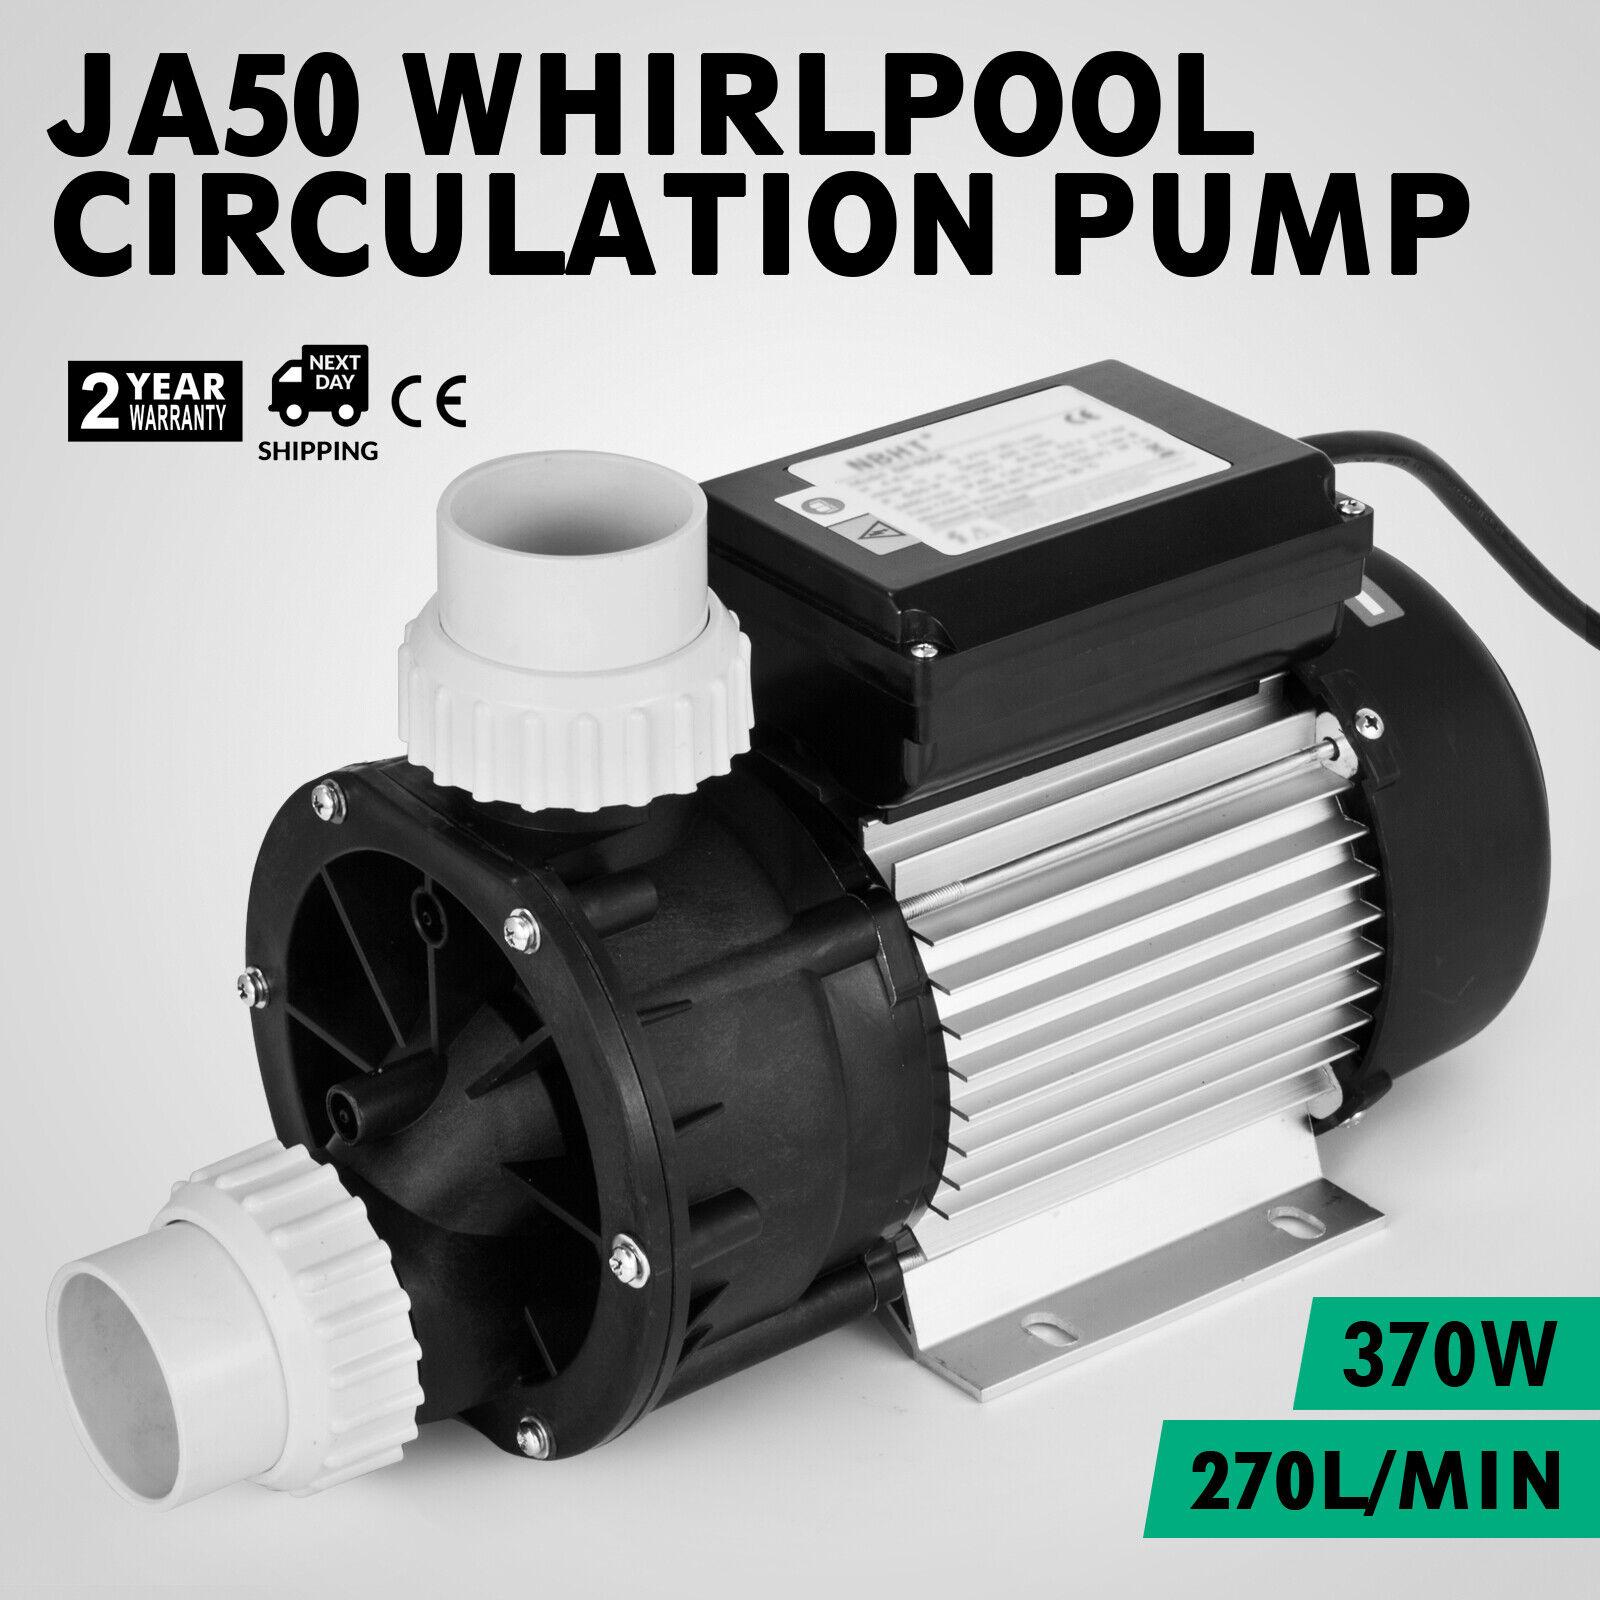 JA50 LX Pompa di Circolazione Whirlpool 270L min Vasca da bagno 2860r min 0.5HP